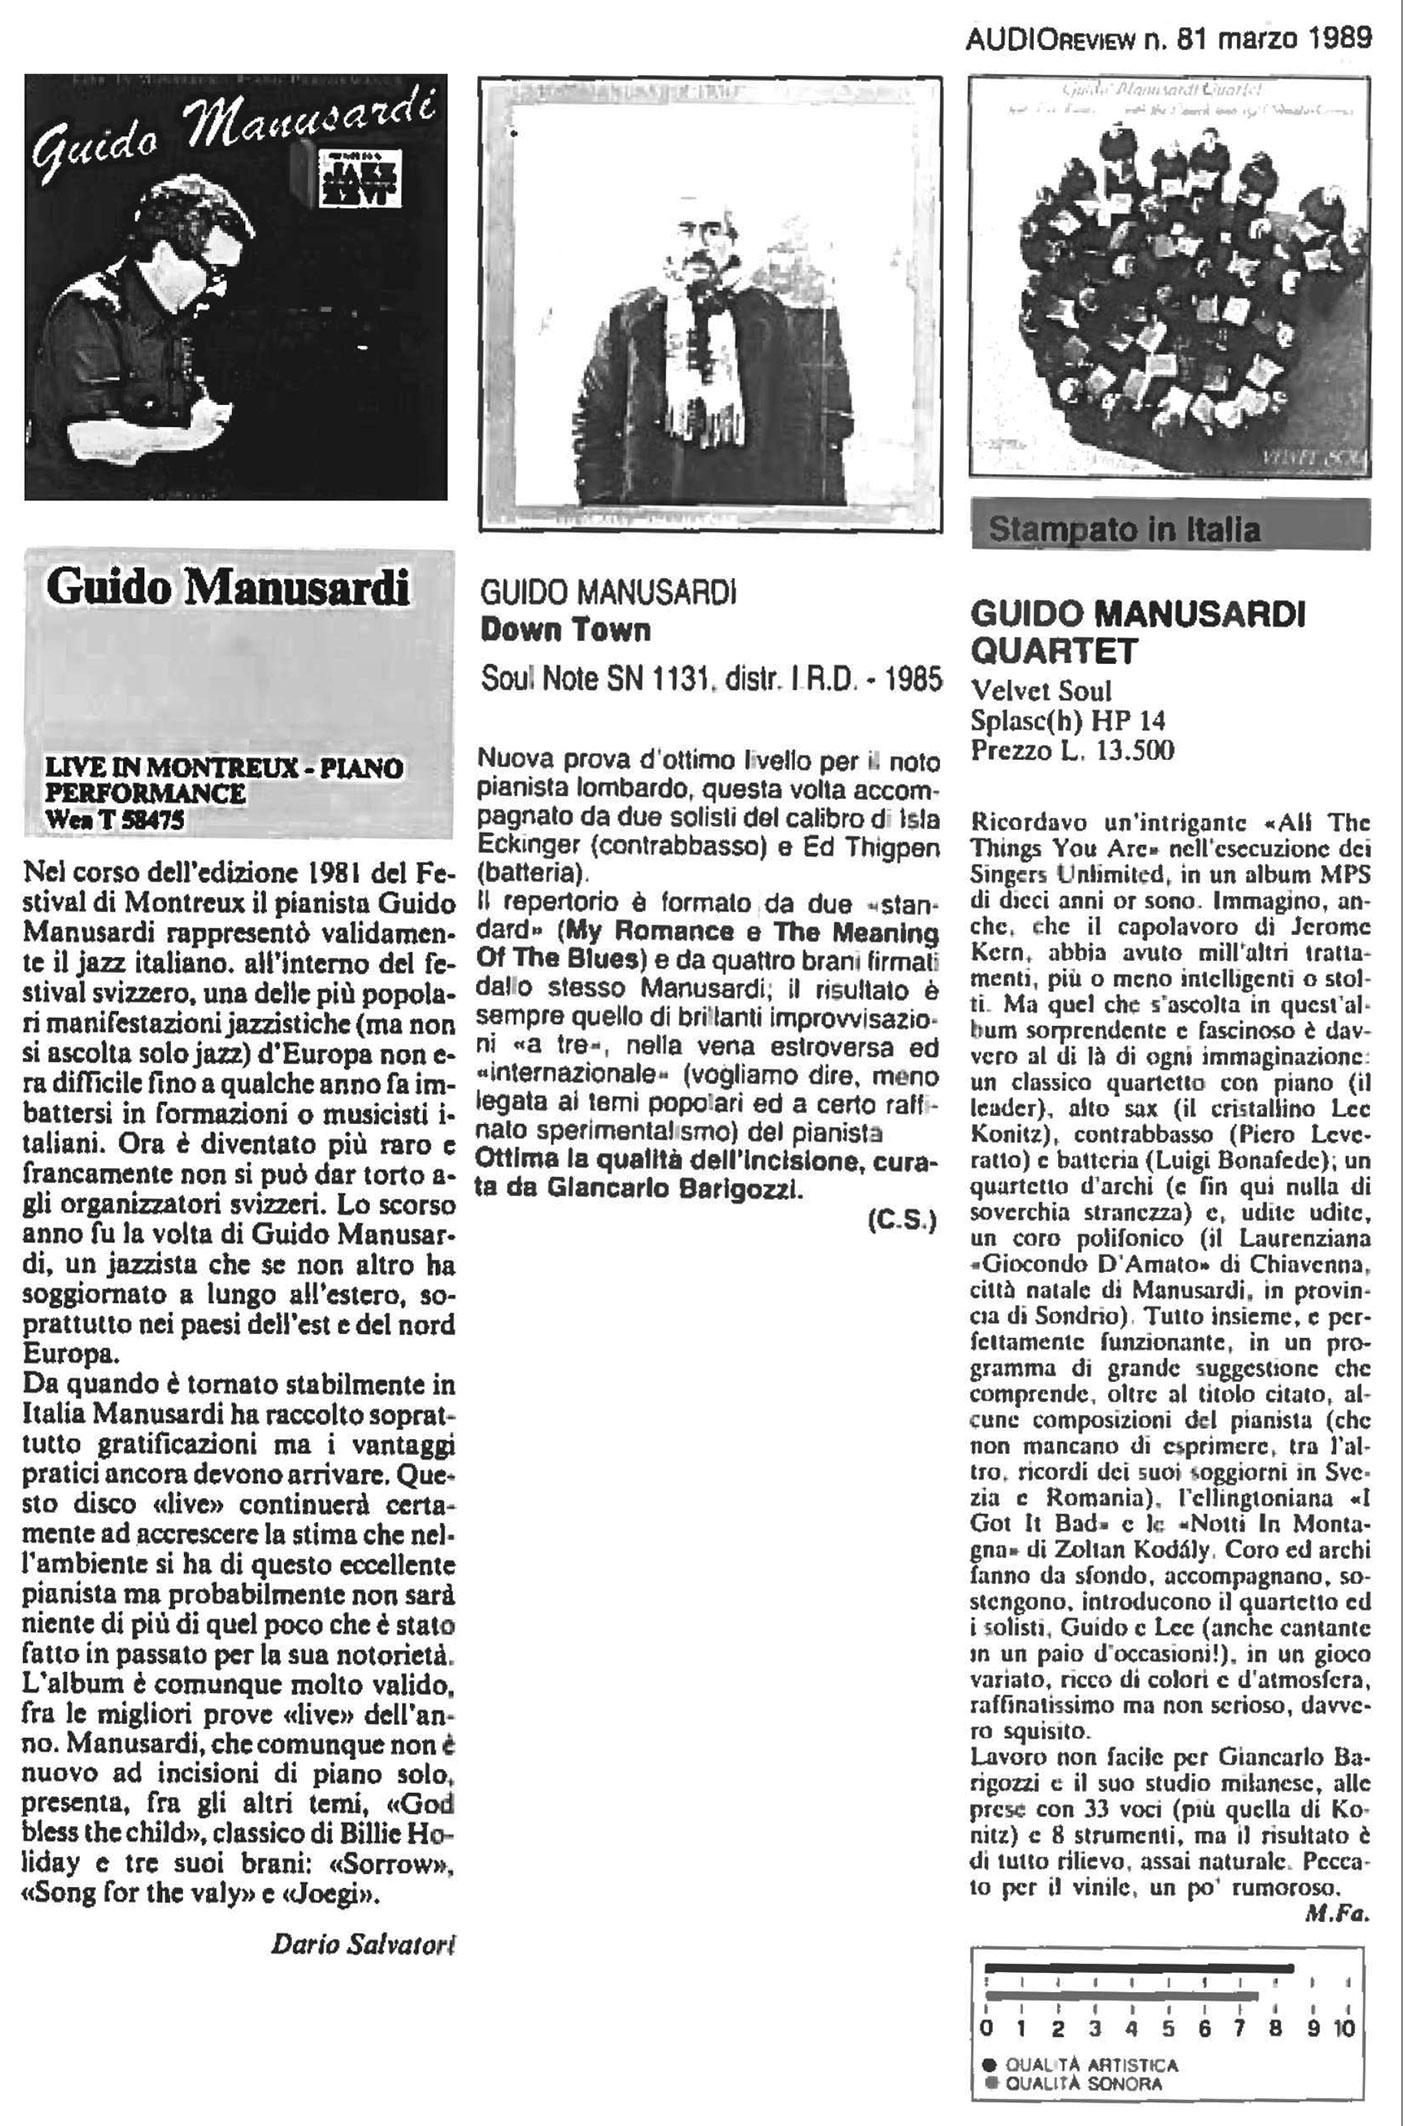 AUDIO REVIEW 1989